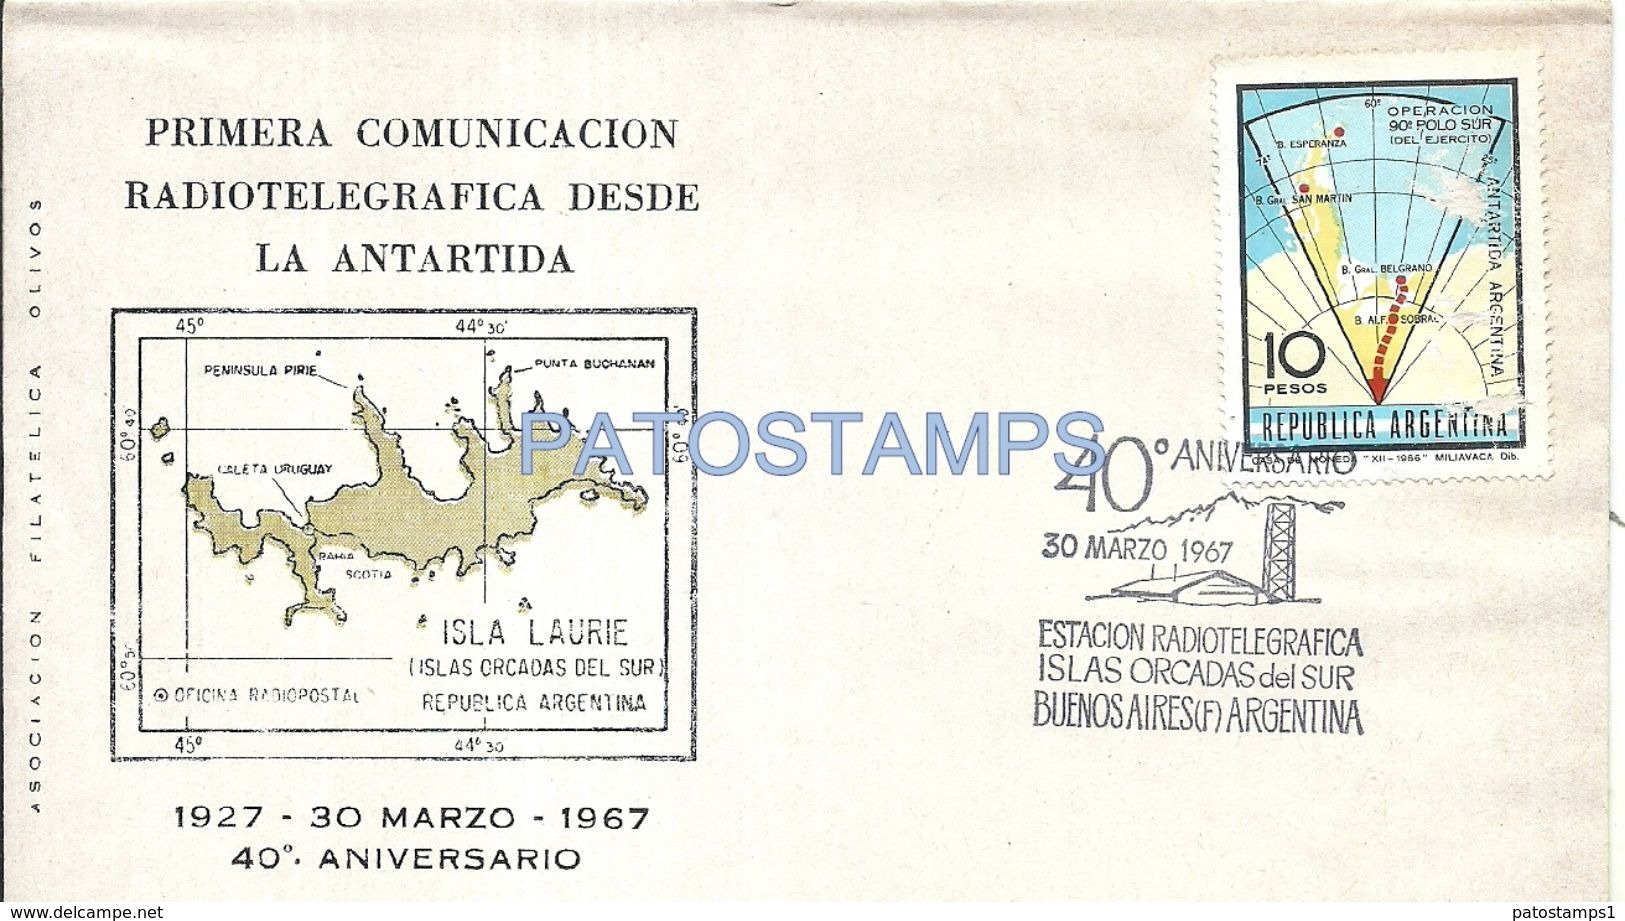 79664 ARGENTINA ANTARTIDA ANTARCTICA COVER 40º ANIVERSARIO 1º COMUNICACION RADIOTELEGRAFICA NO POSTCARD - Unclassified